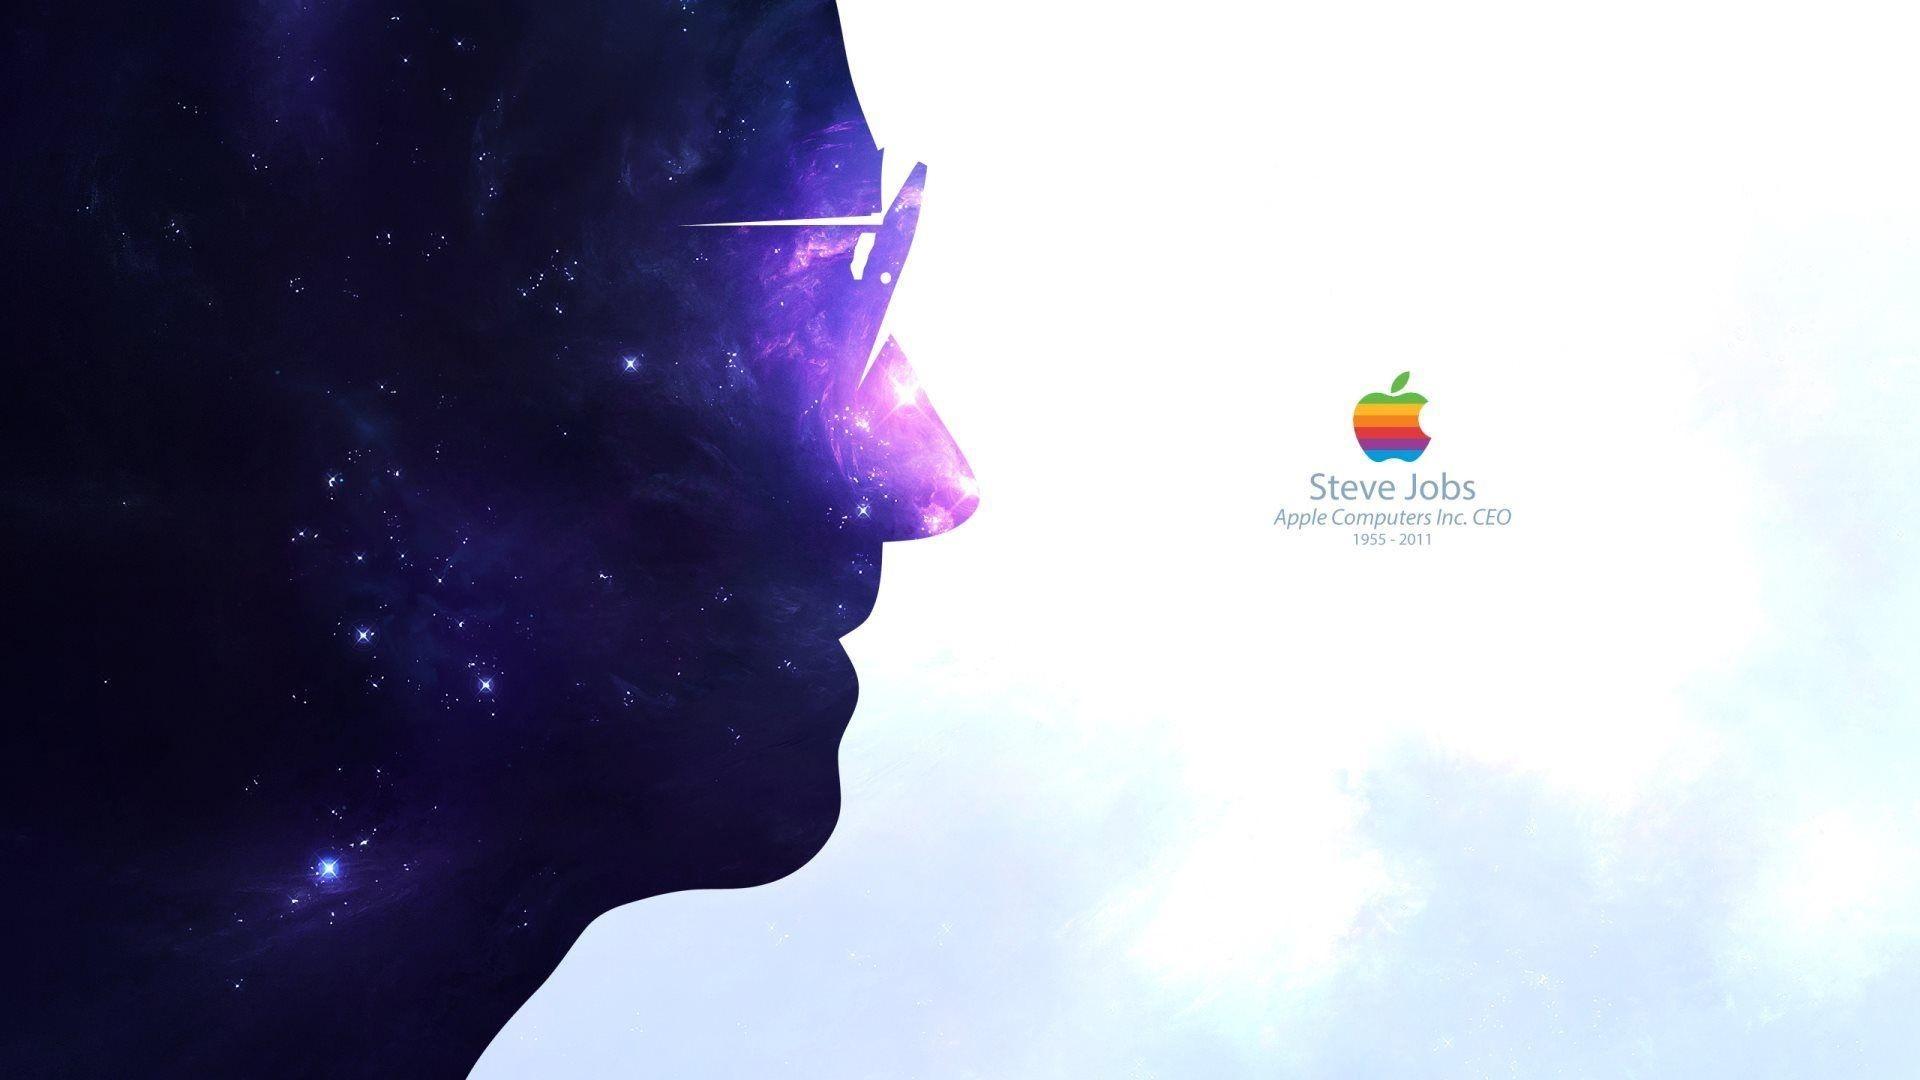 Steve Jobs PC Wallpaper HD